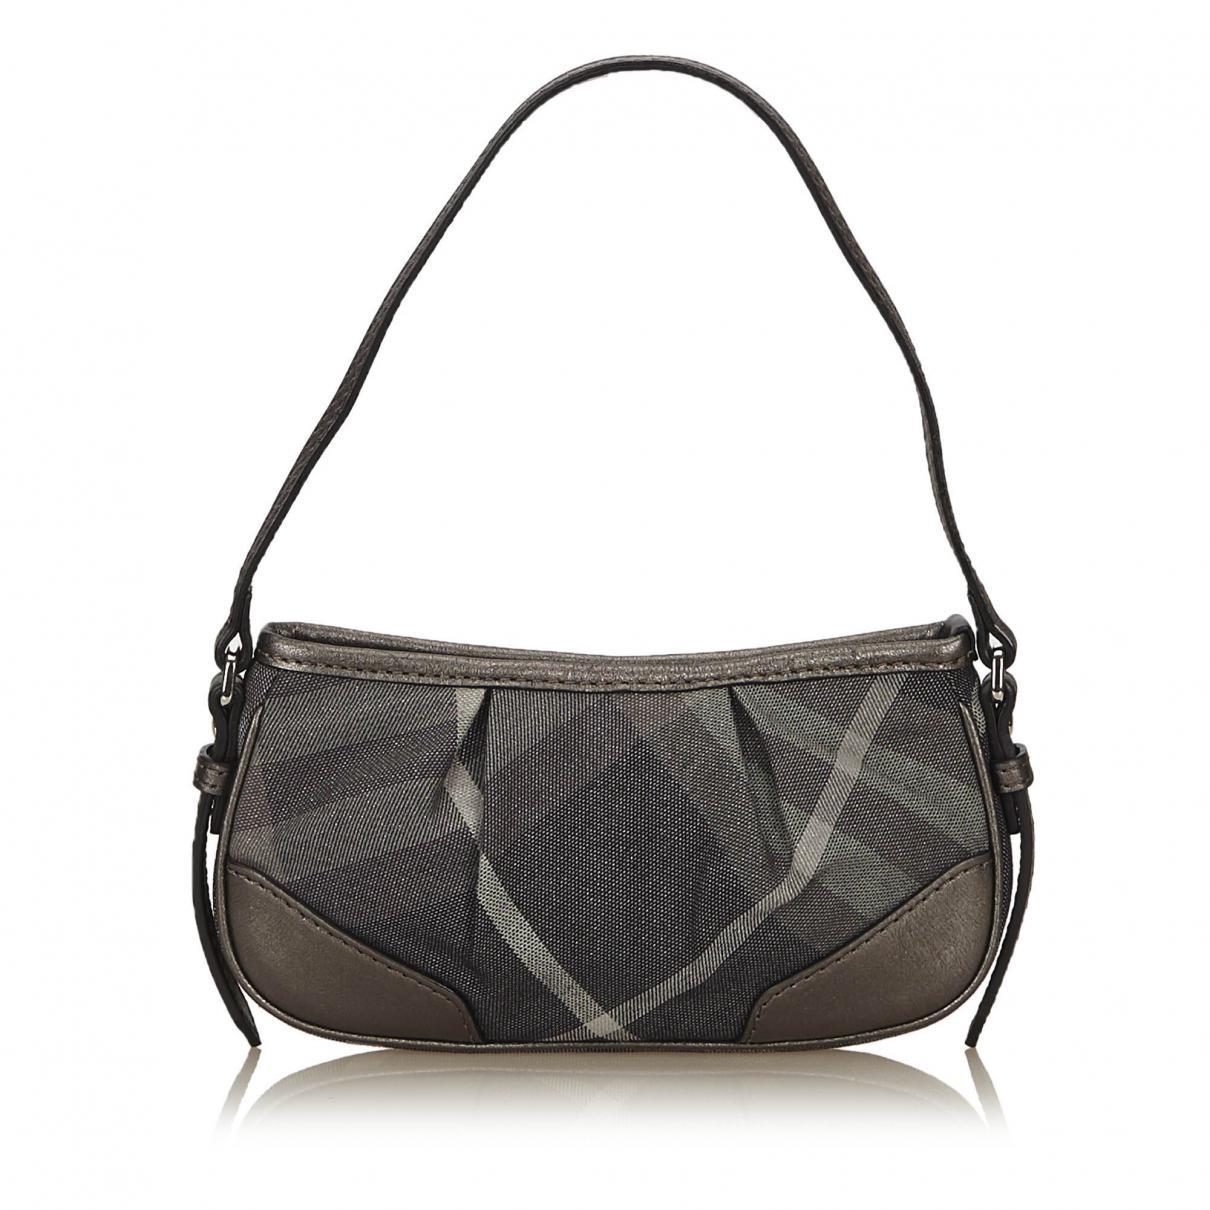 Burberry Pre-owned - Cloth handbag VeD5DOJc